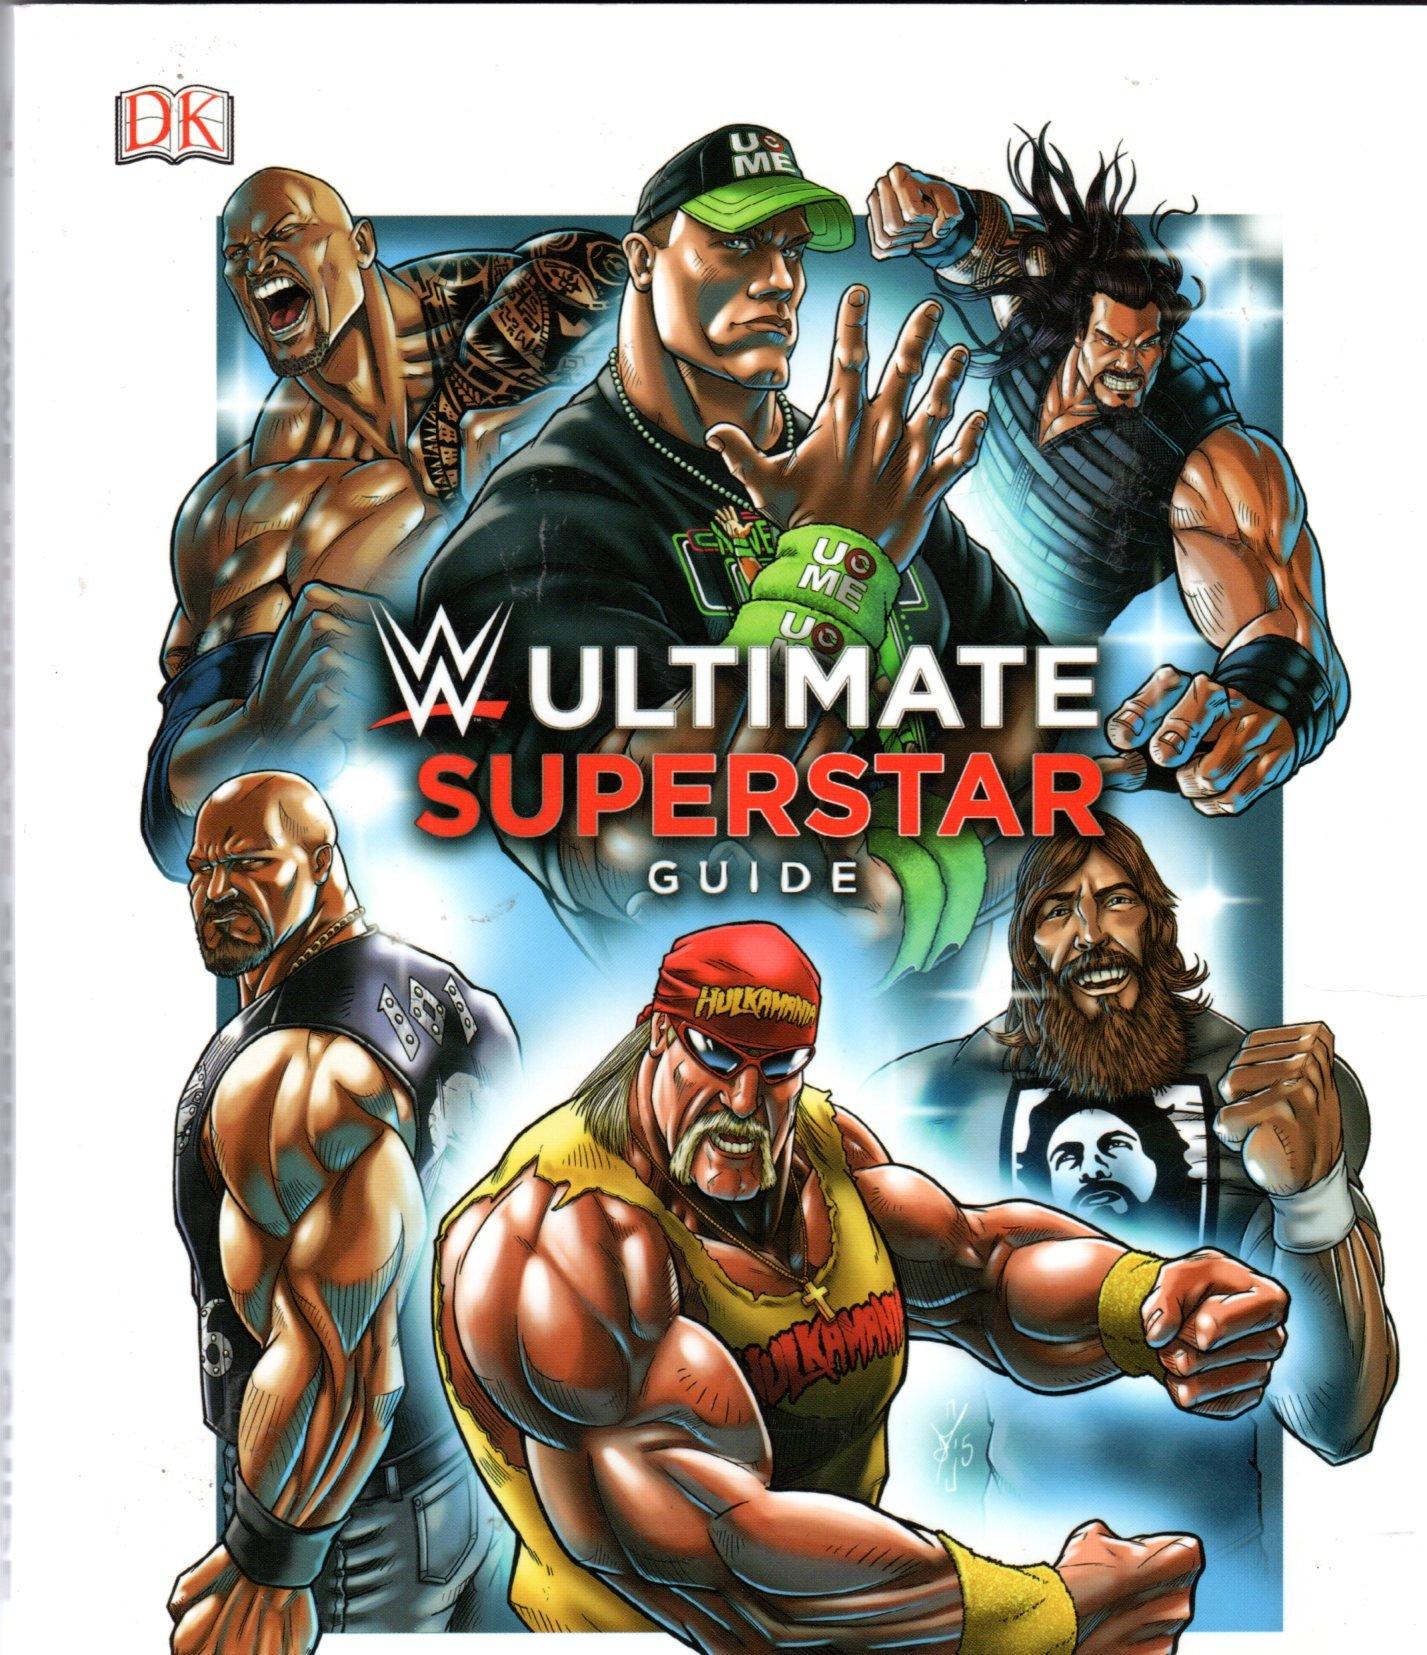 WWE Ultimate Superstar Guide: 9781465445599: Amazon.com: Books